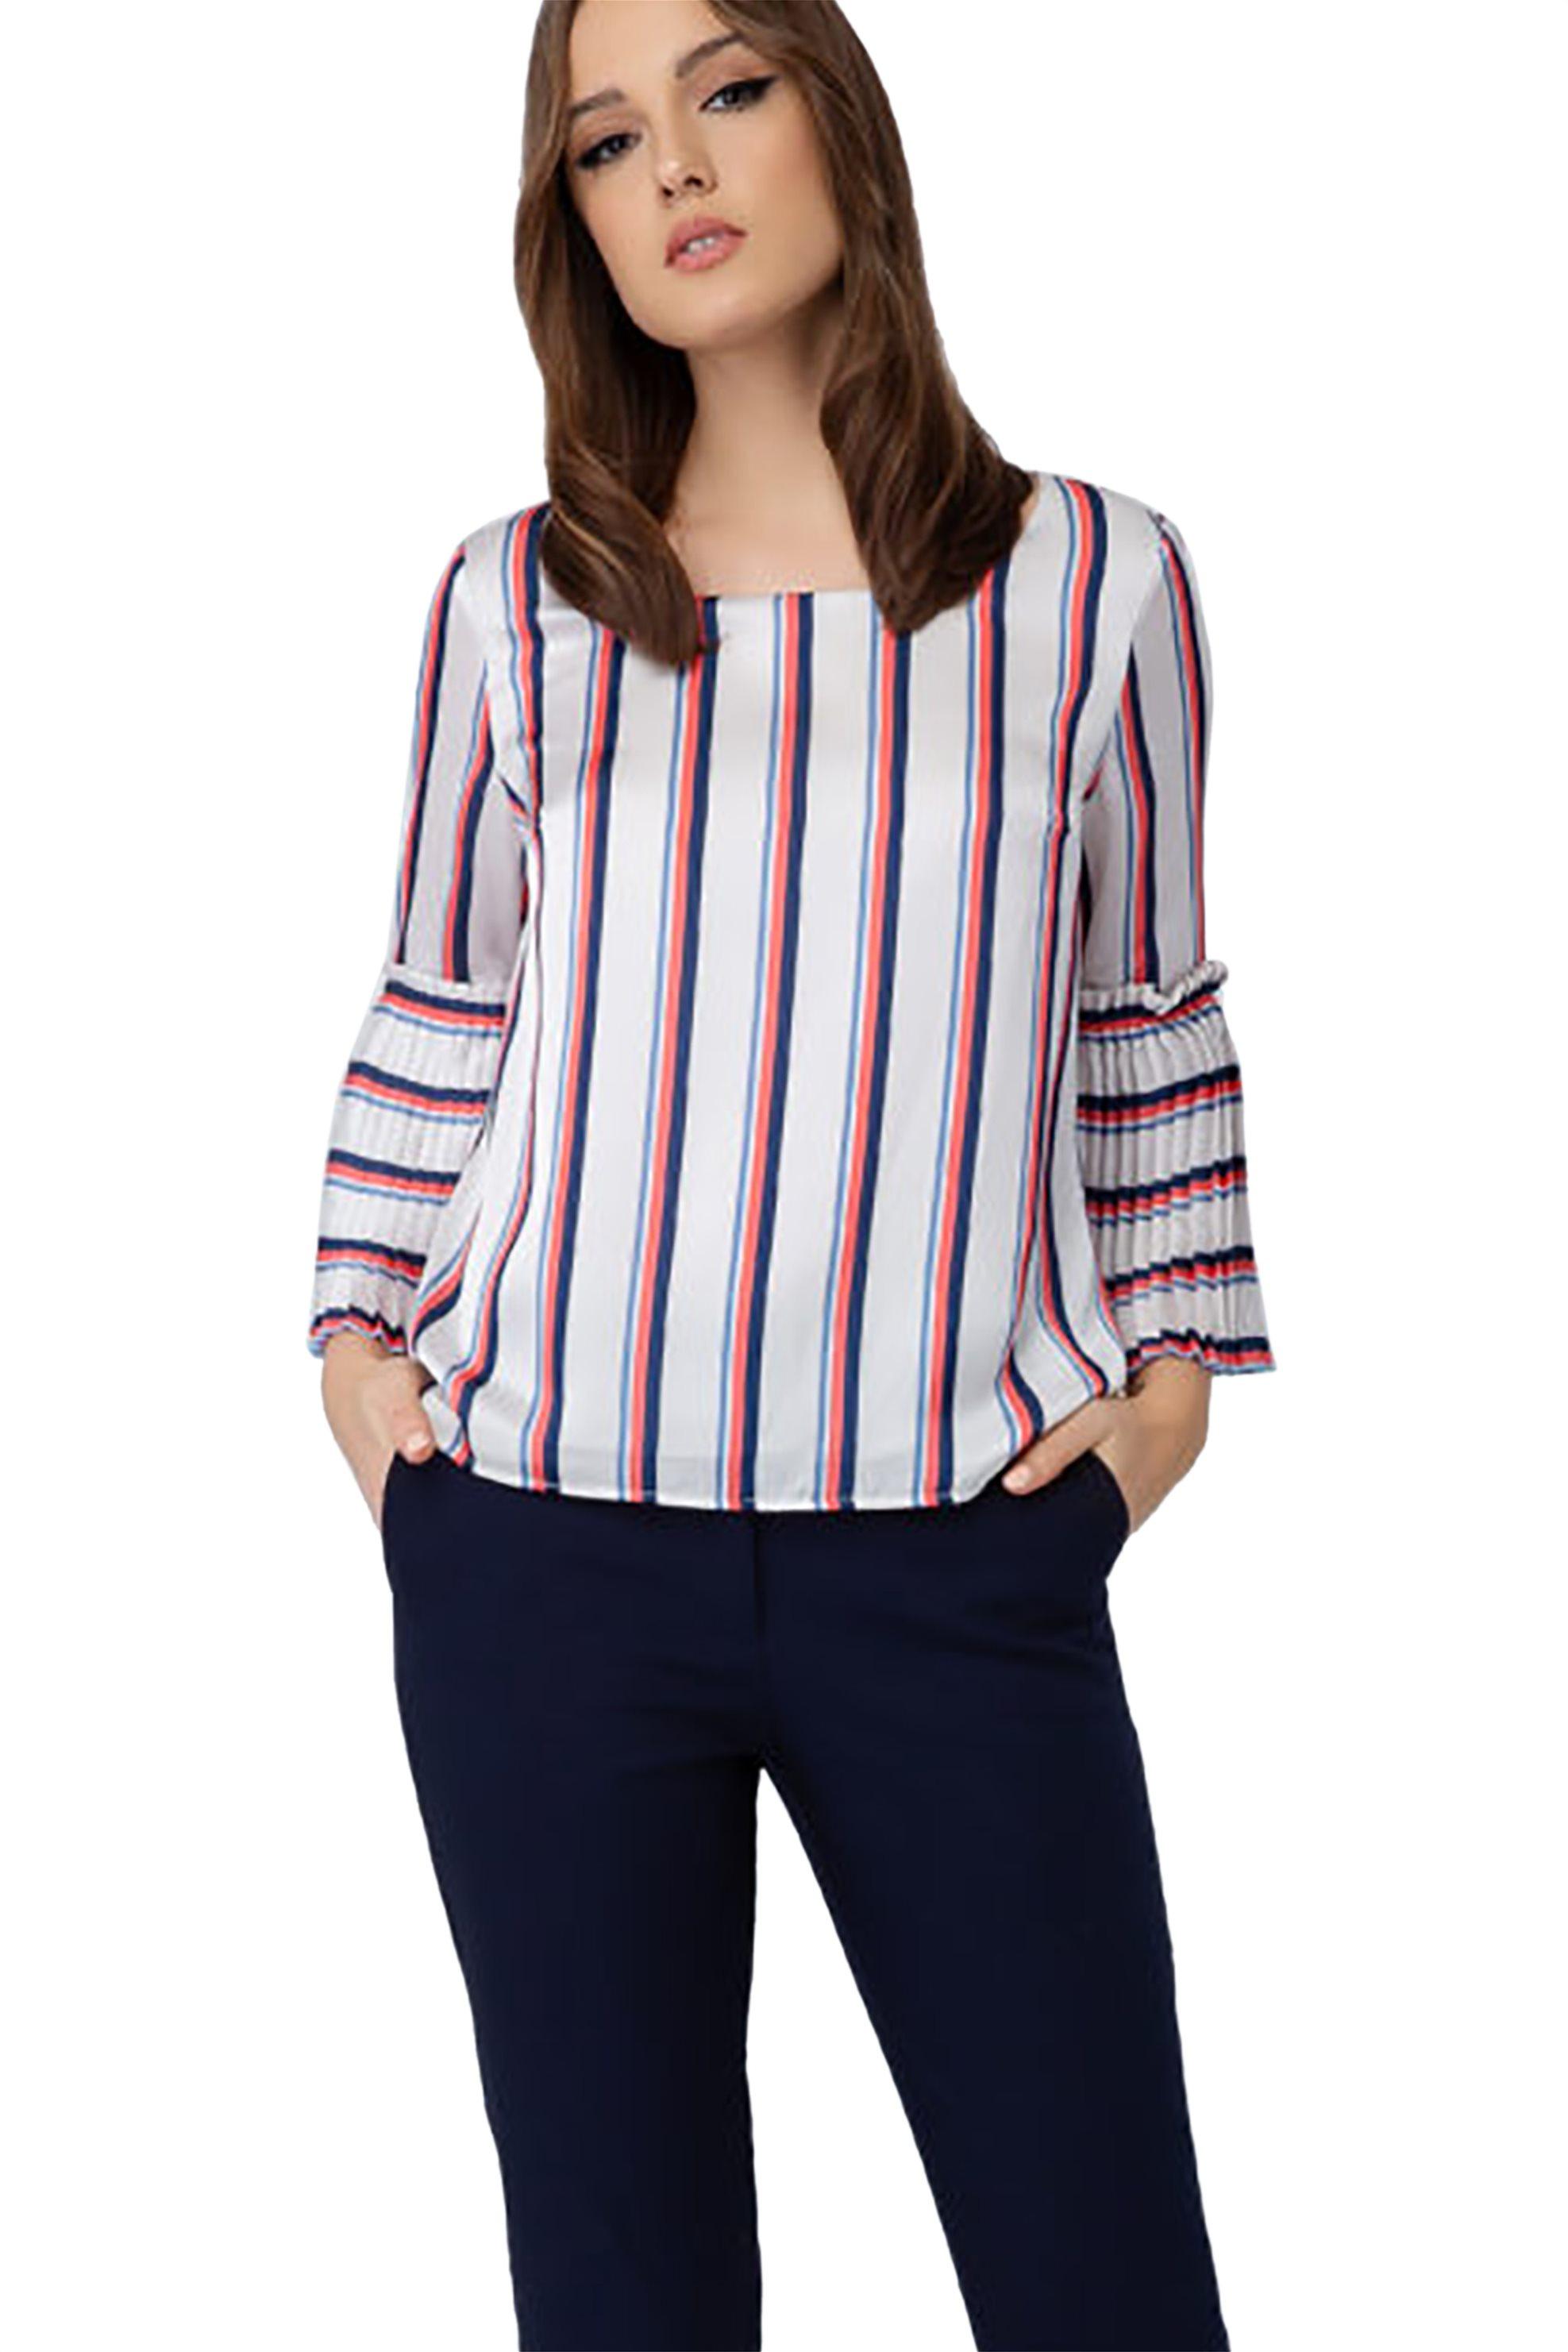 Billy Sabbado γυναικεία ριγέ μπλούζα με πλισέ μανίκι - 0234218103 - Λευκό γυναικα   ρουχα   tops   μπλούζες   casual